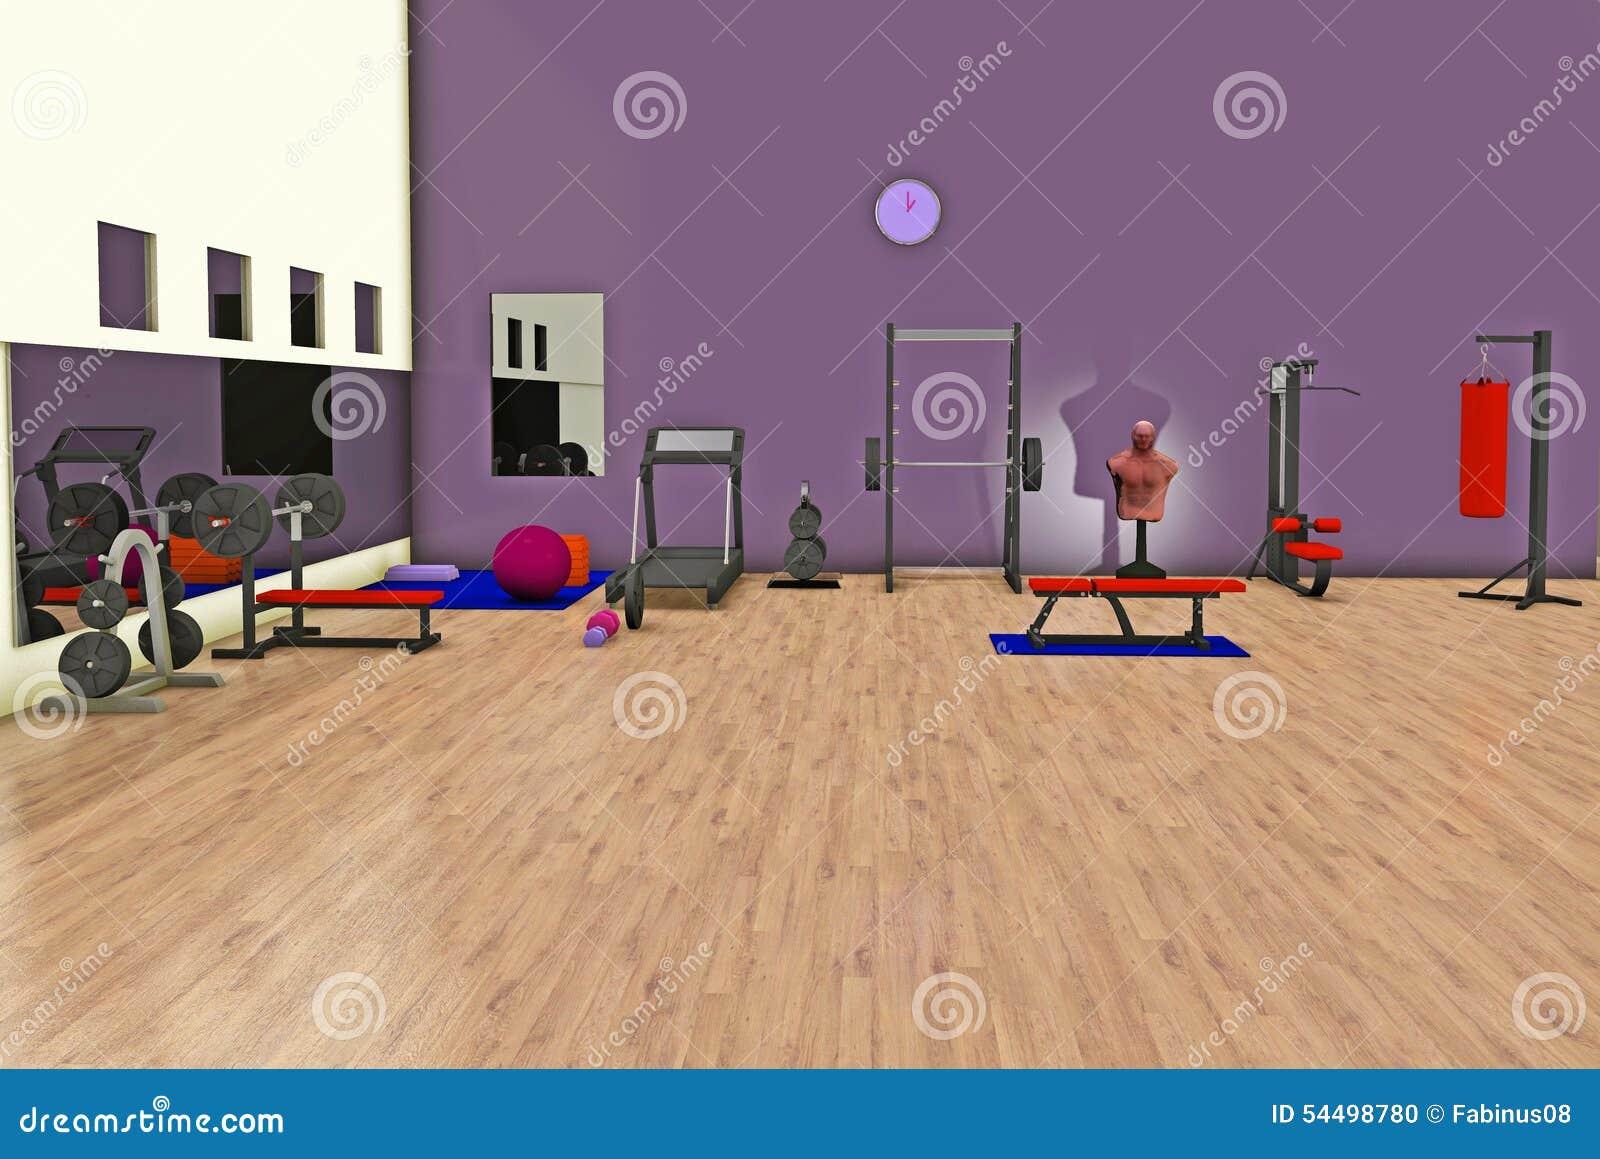 Fitness center stock illustration image